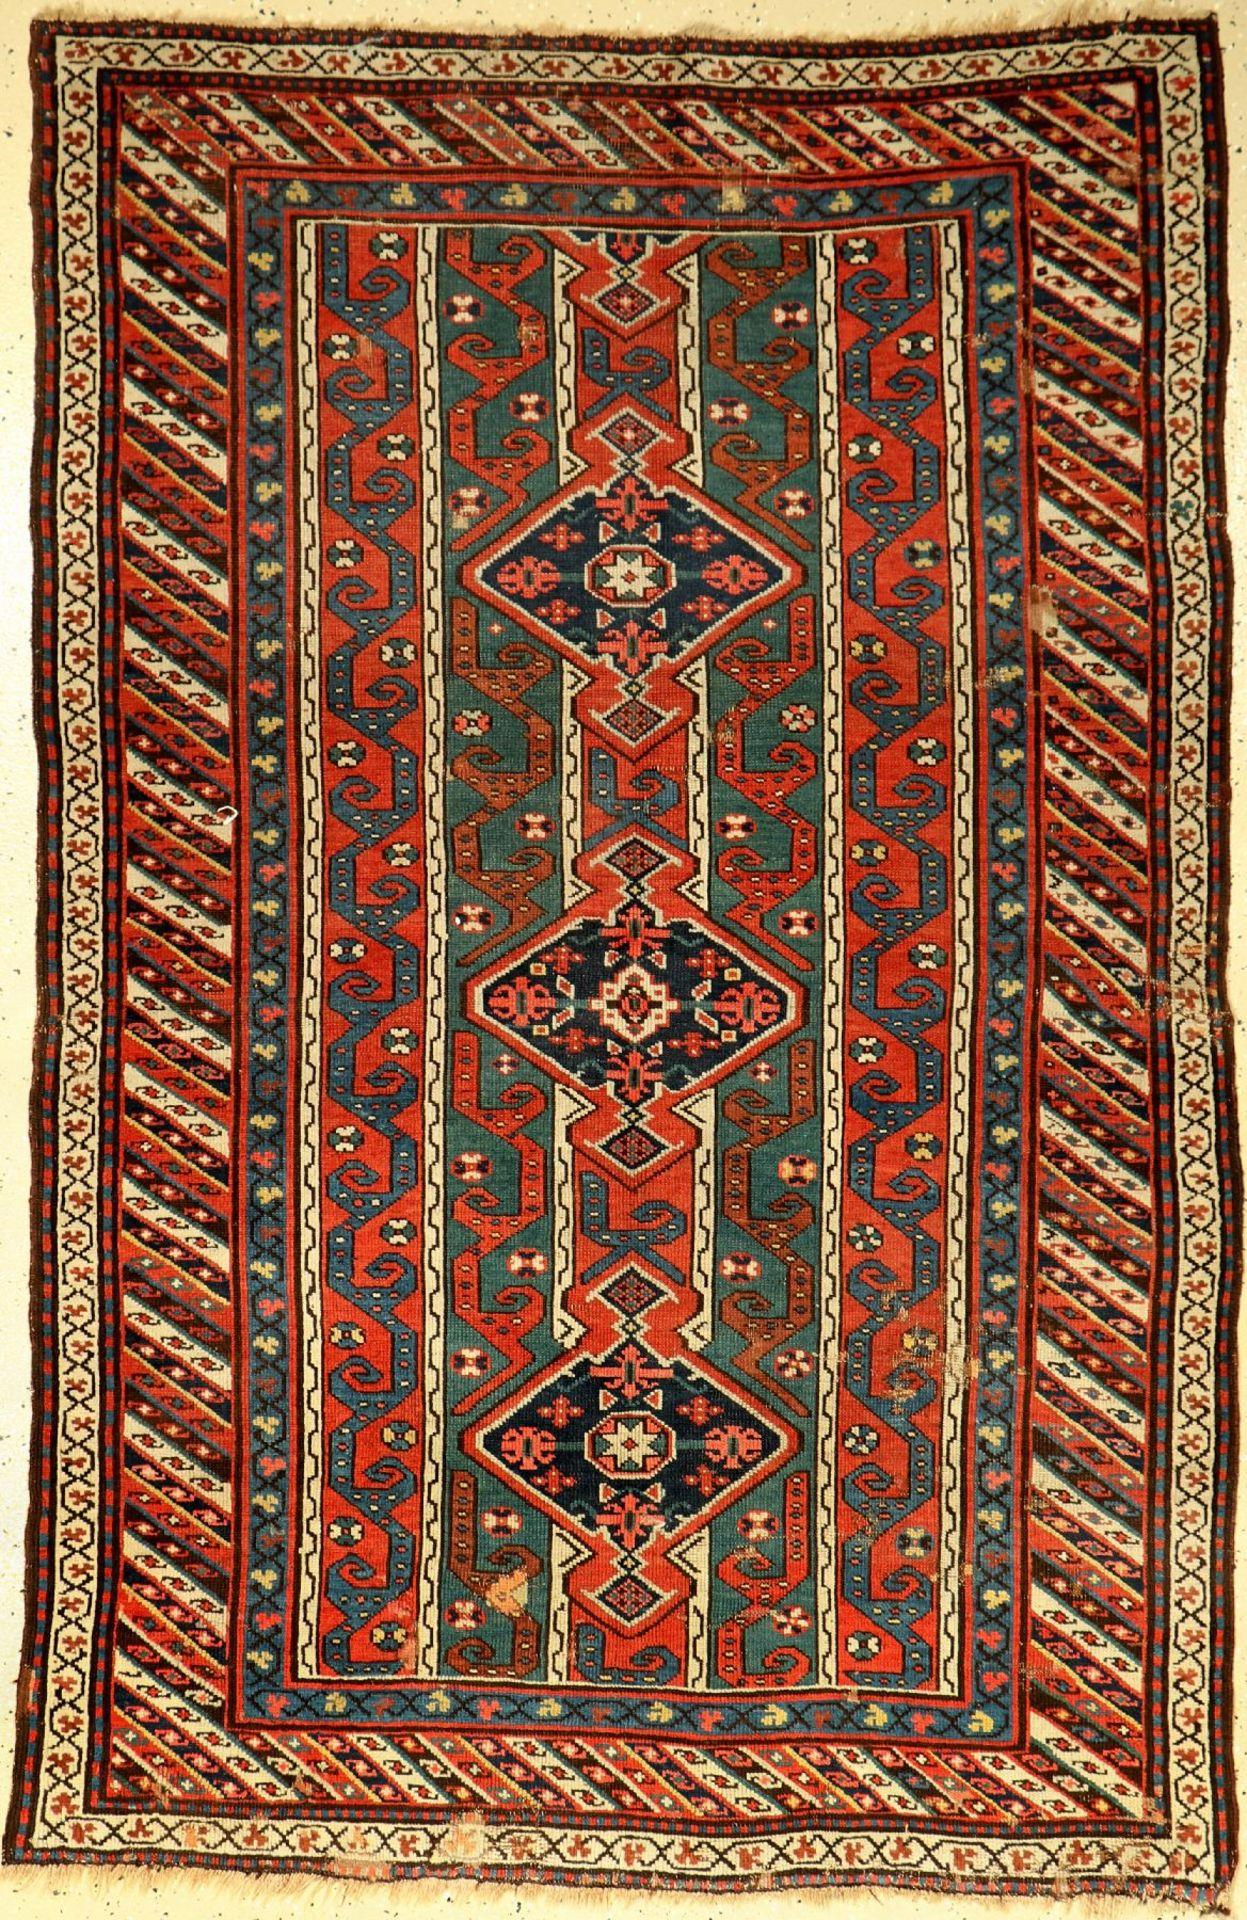 Karabagh antik, Kaukasus, um 1900, Wolle auf Wolle, ca. 193 x 125 cm, EHZ: 4-5Antique karabagh,